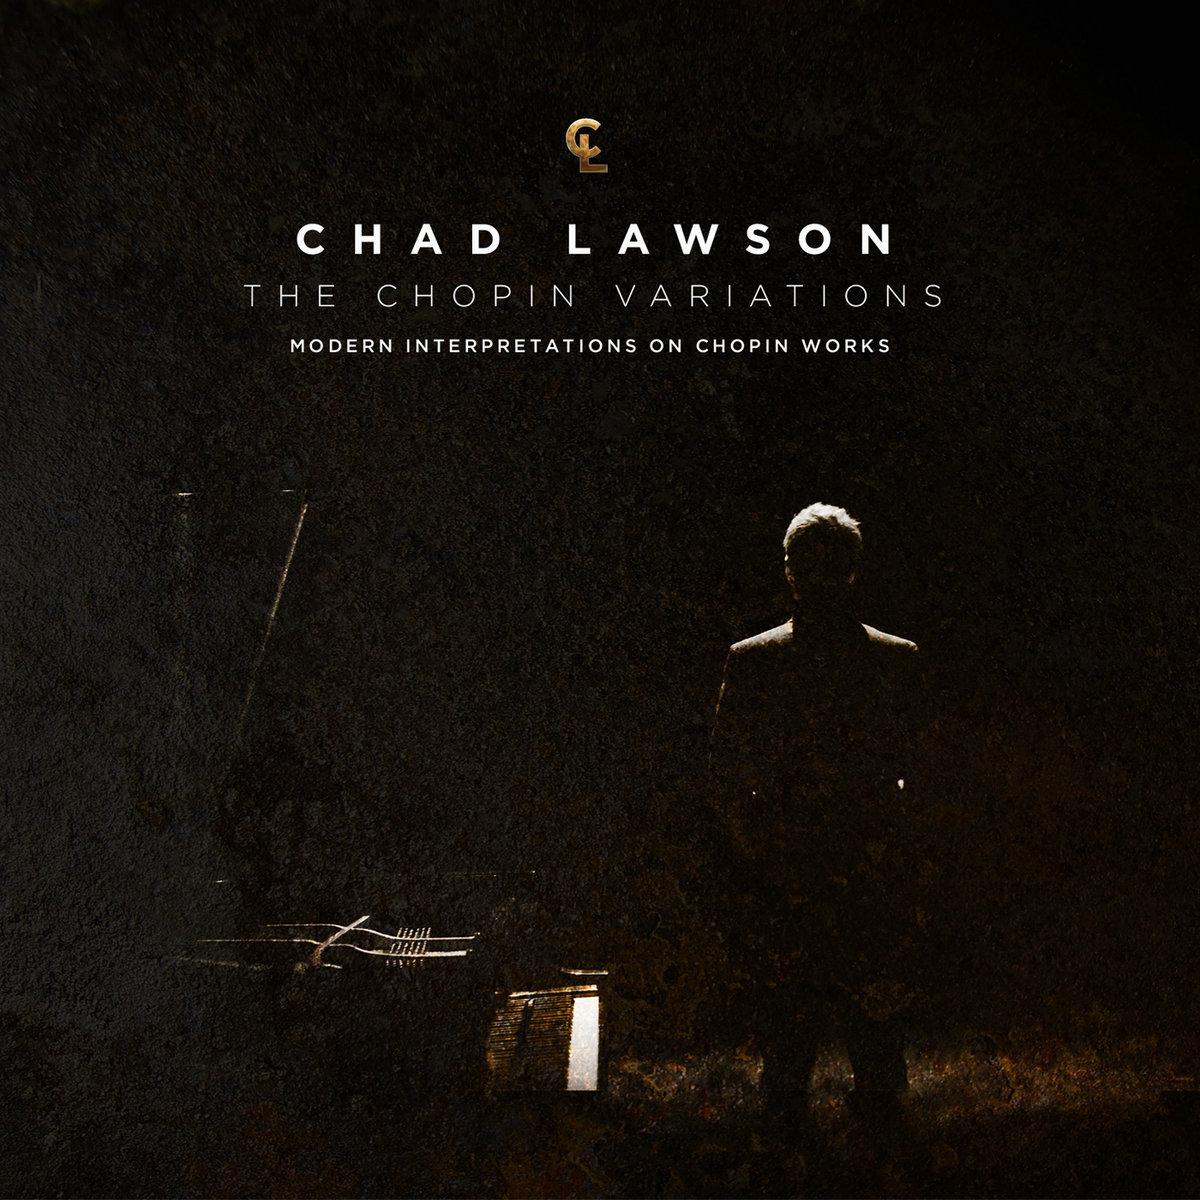 The Chopin Variations / Modern Interpretations on Chopin Works